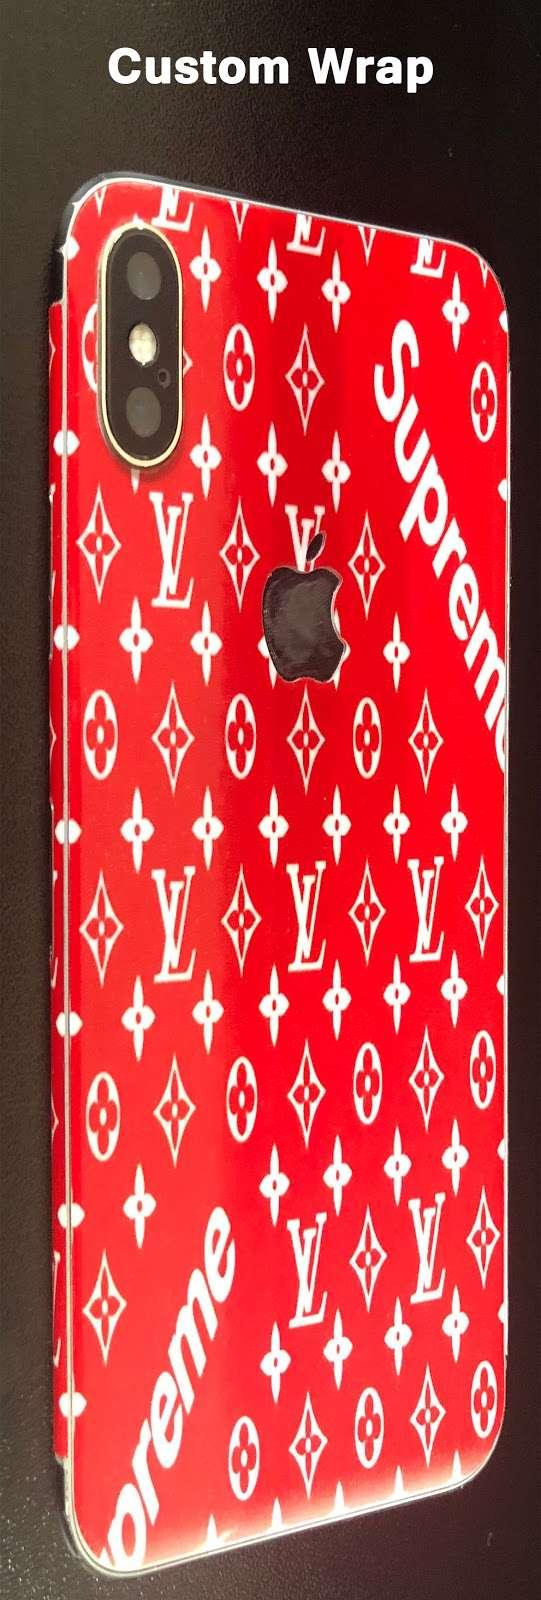 WIRELESS 4G (#1 Ranked iPhone Repair Center) - store  | Photo 9 of 10 | Address: 12611 Woodforest Blvd, Houston, TX 77015, USA | Phone: (713) 330-9400